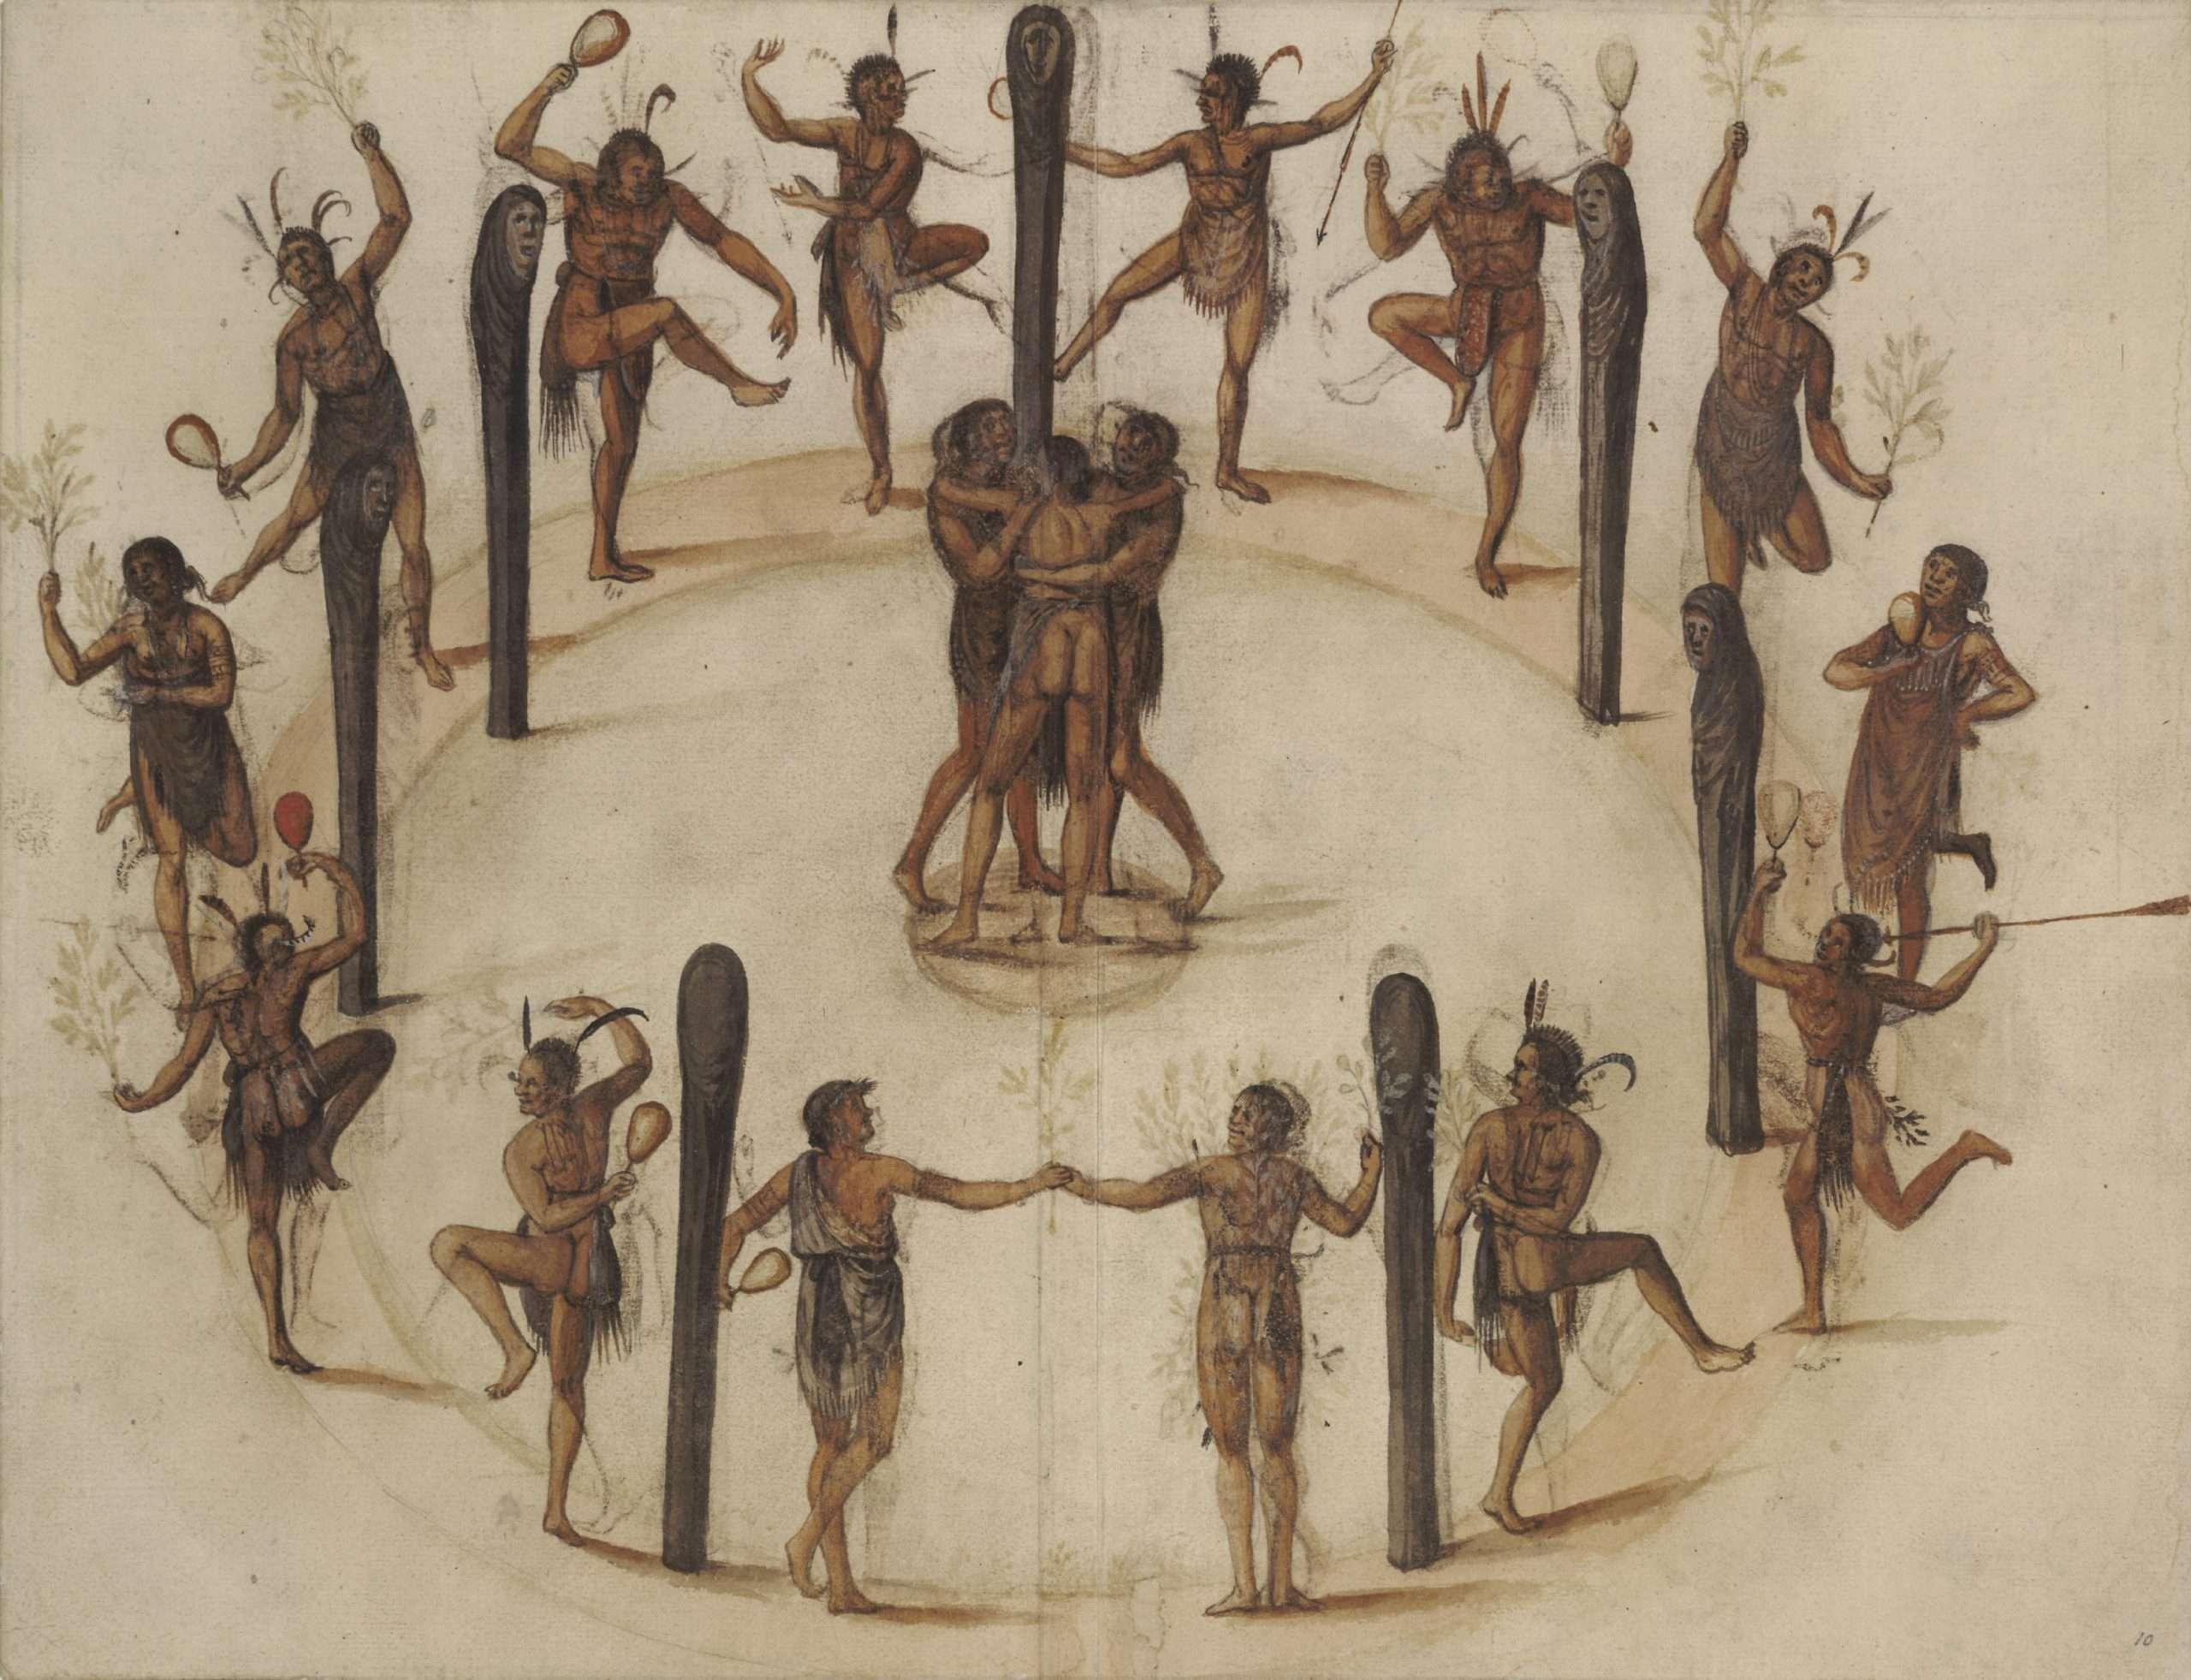 A Festive Dance